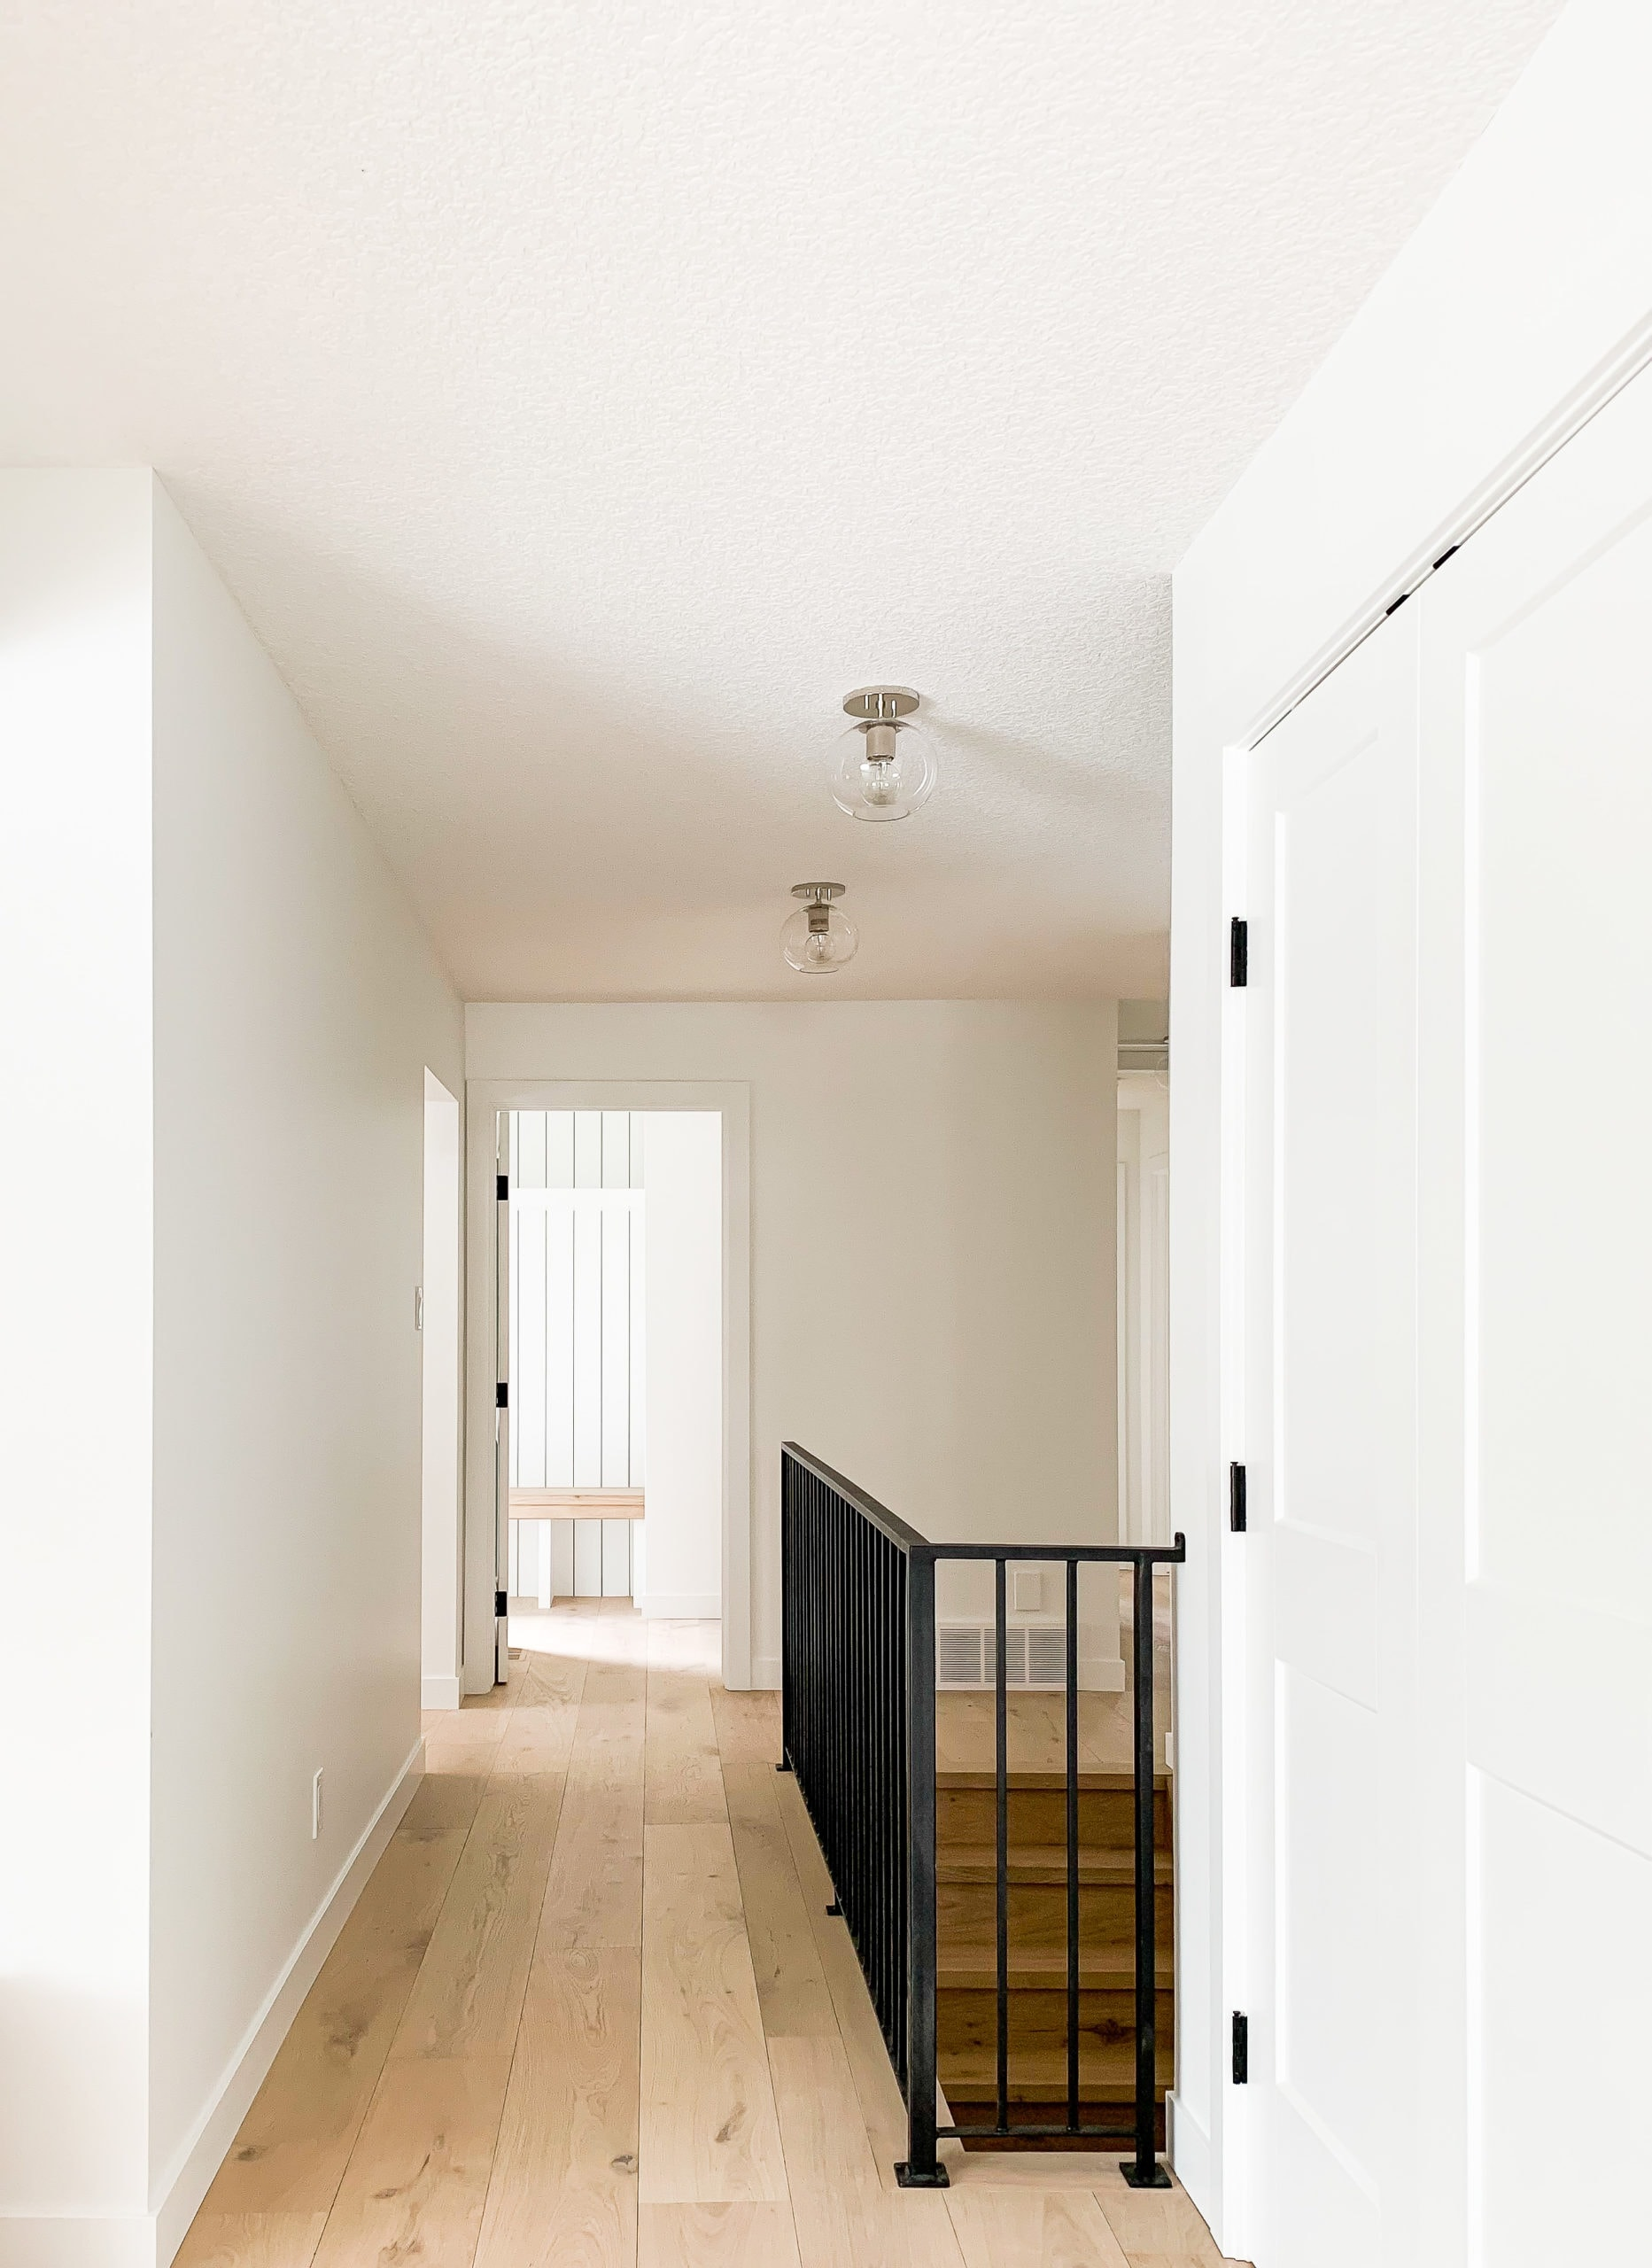 Full Home Renovation - Earthy Coastal Scandinavian California Minimal House Remodel